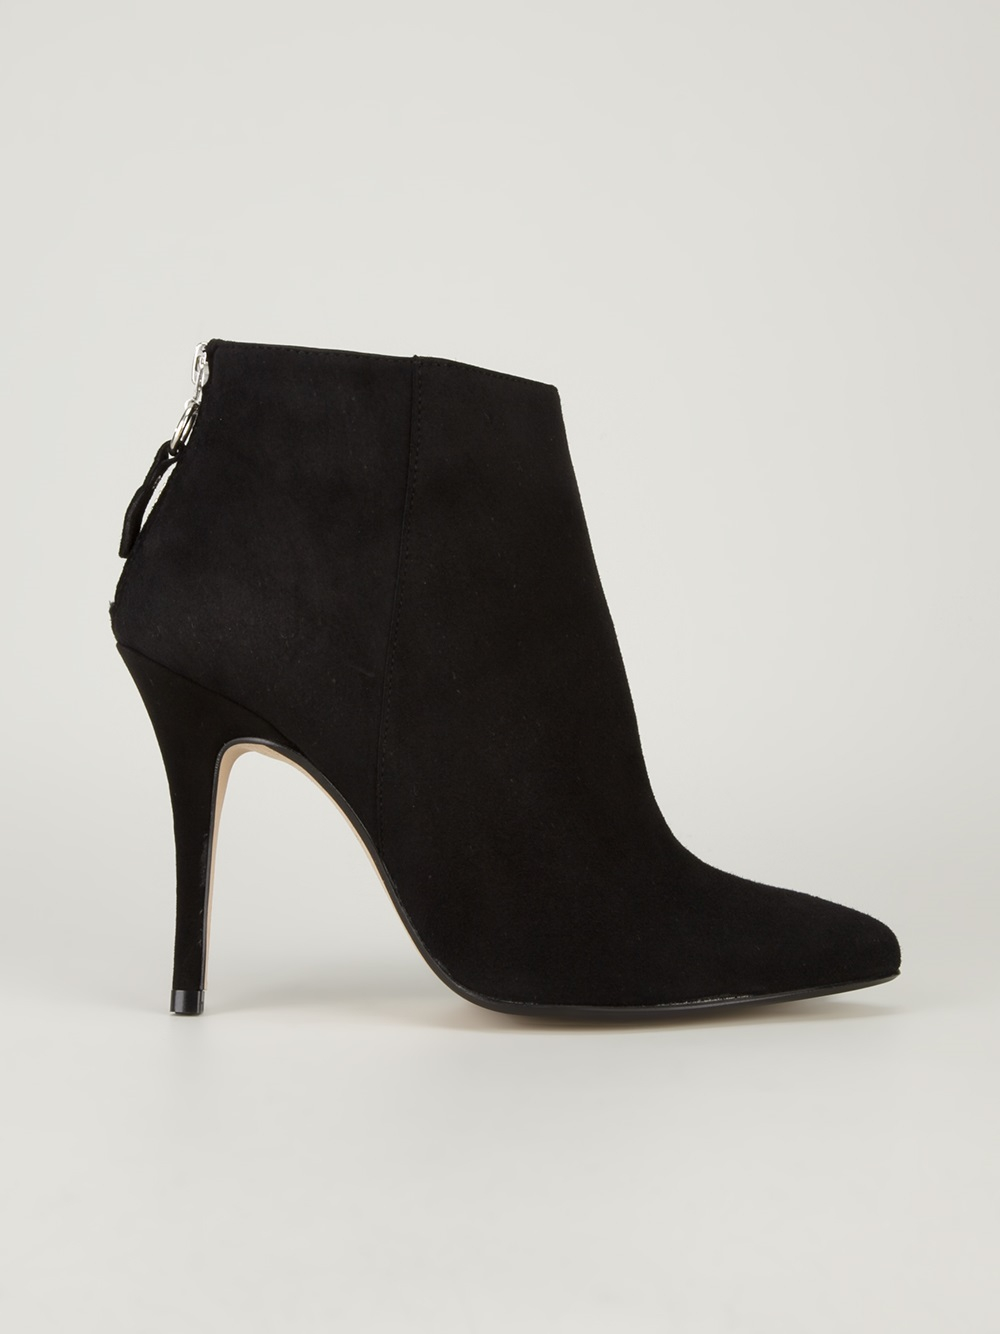 Gardenia Stiletto Ankle Boot in Black | Lyst